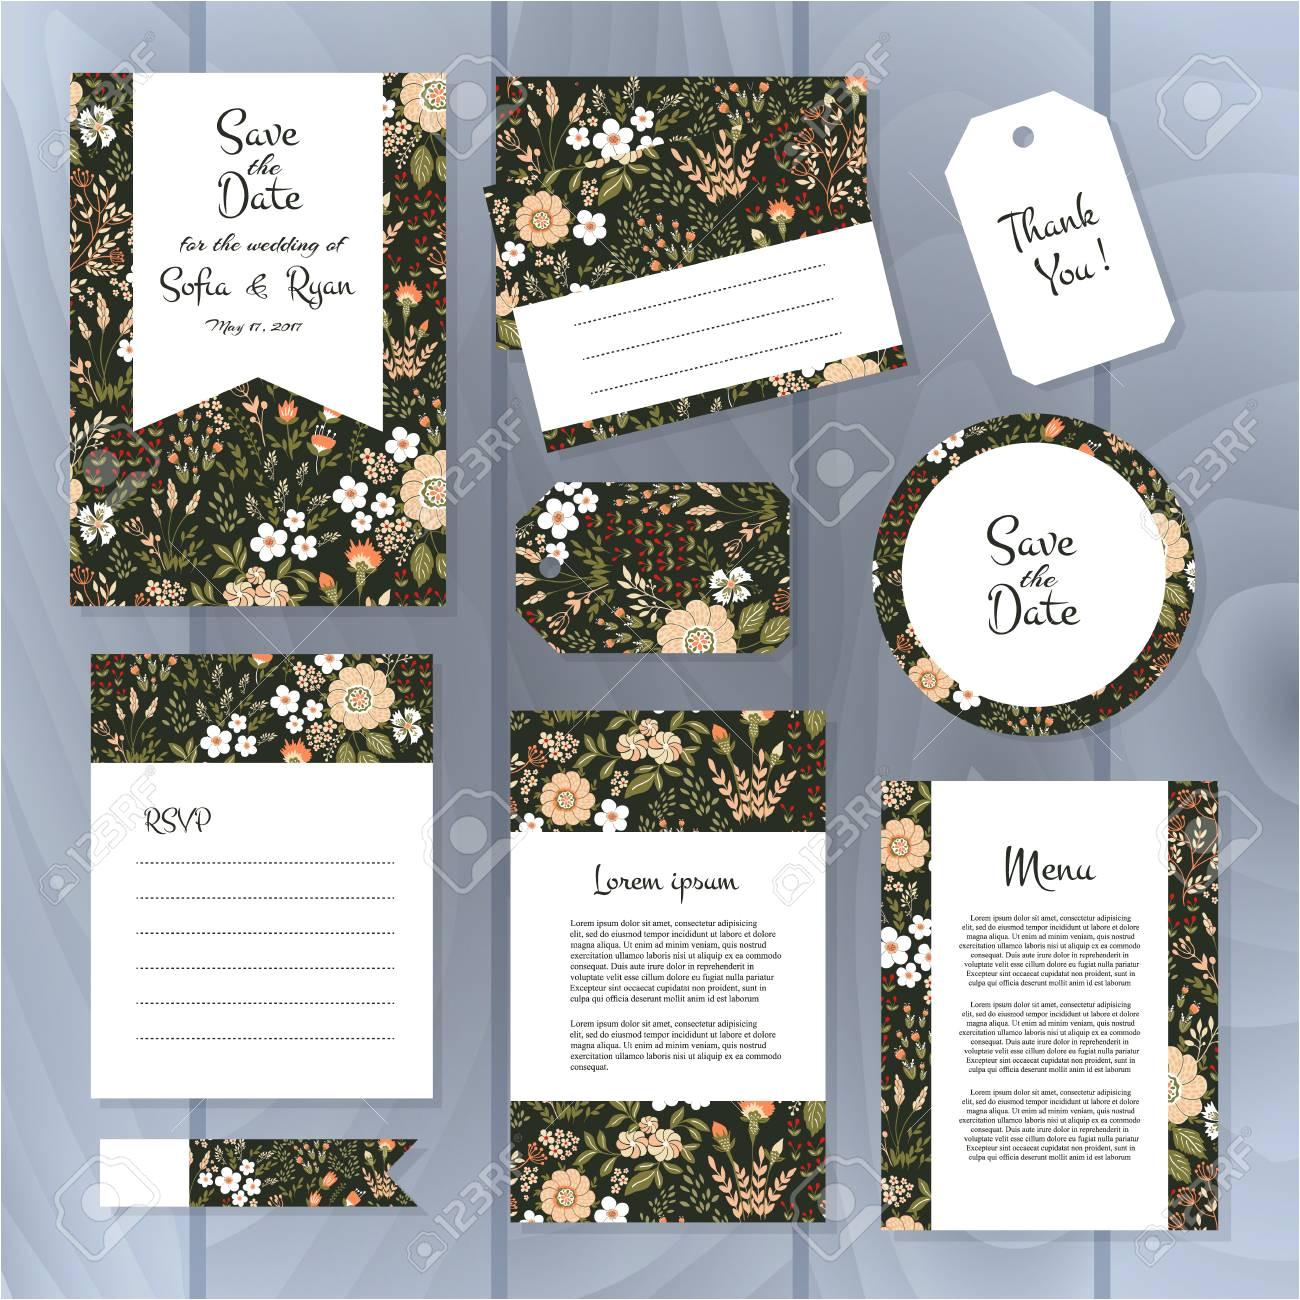 67943495 vector gentle wedding cards template with flower design wedding invitation or save the date rsvp men jpg